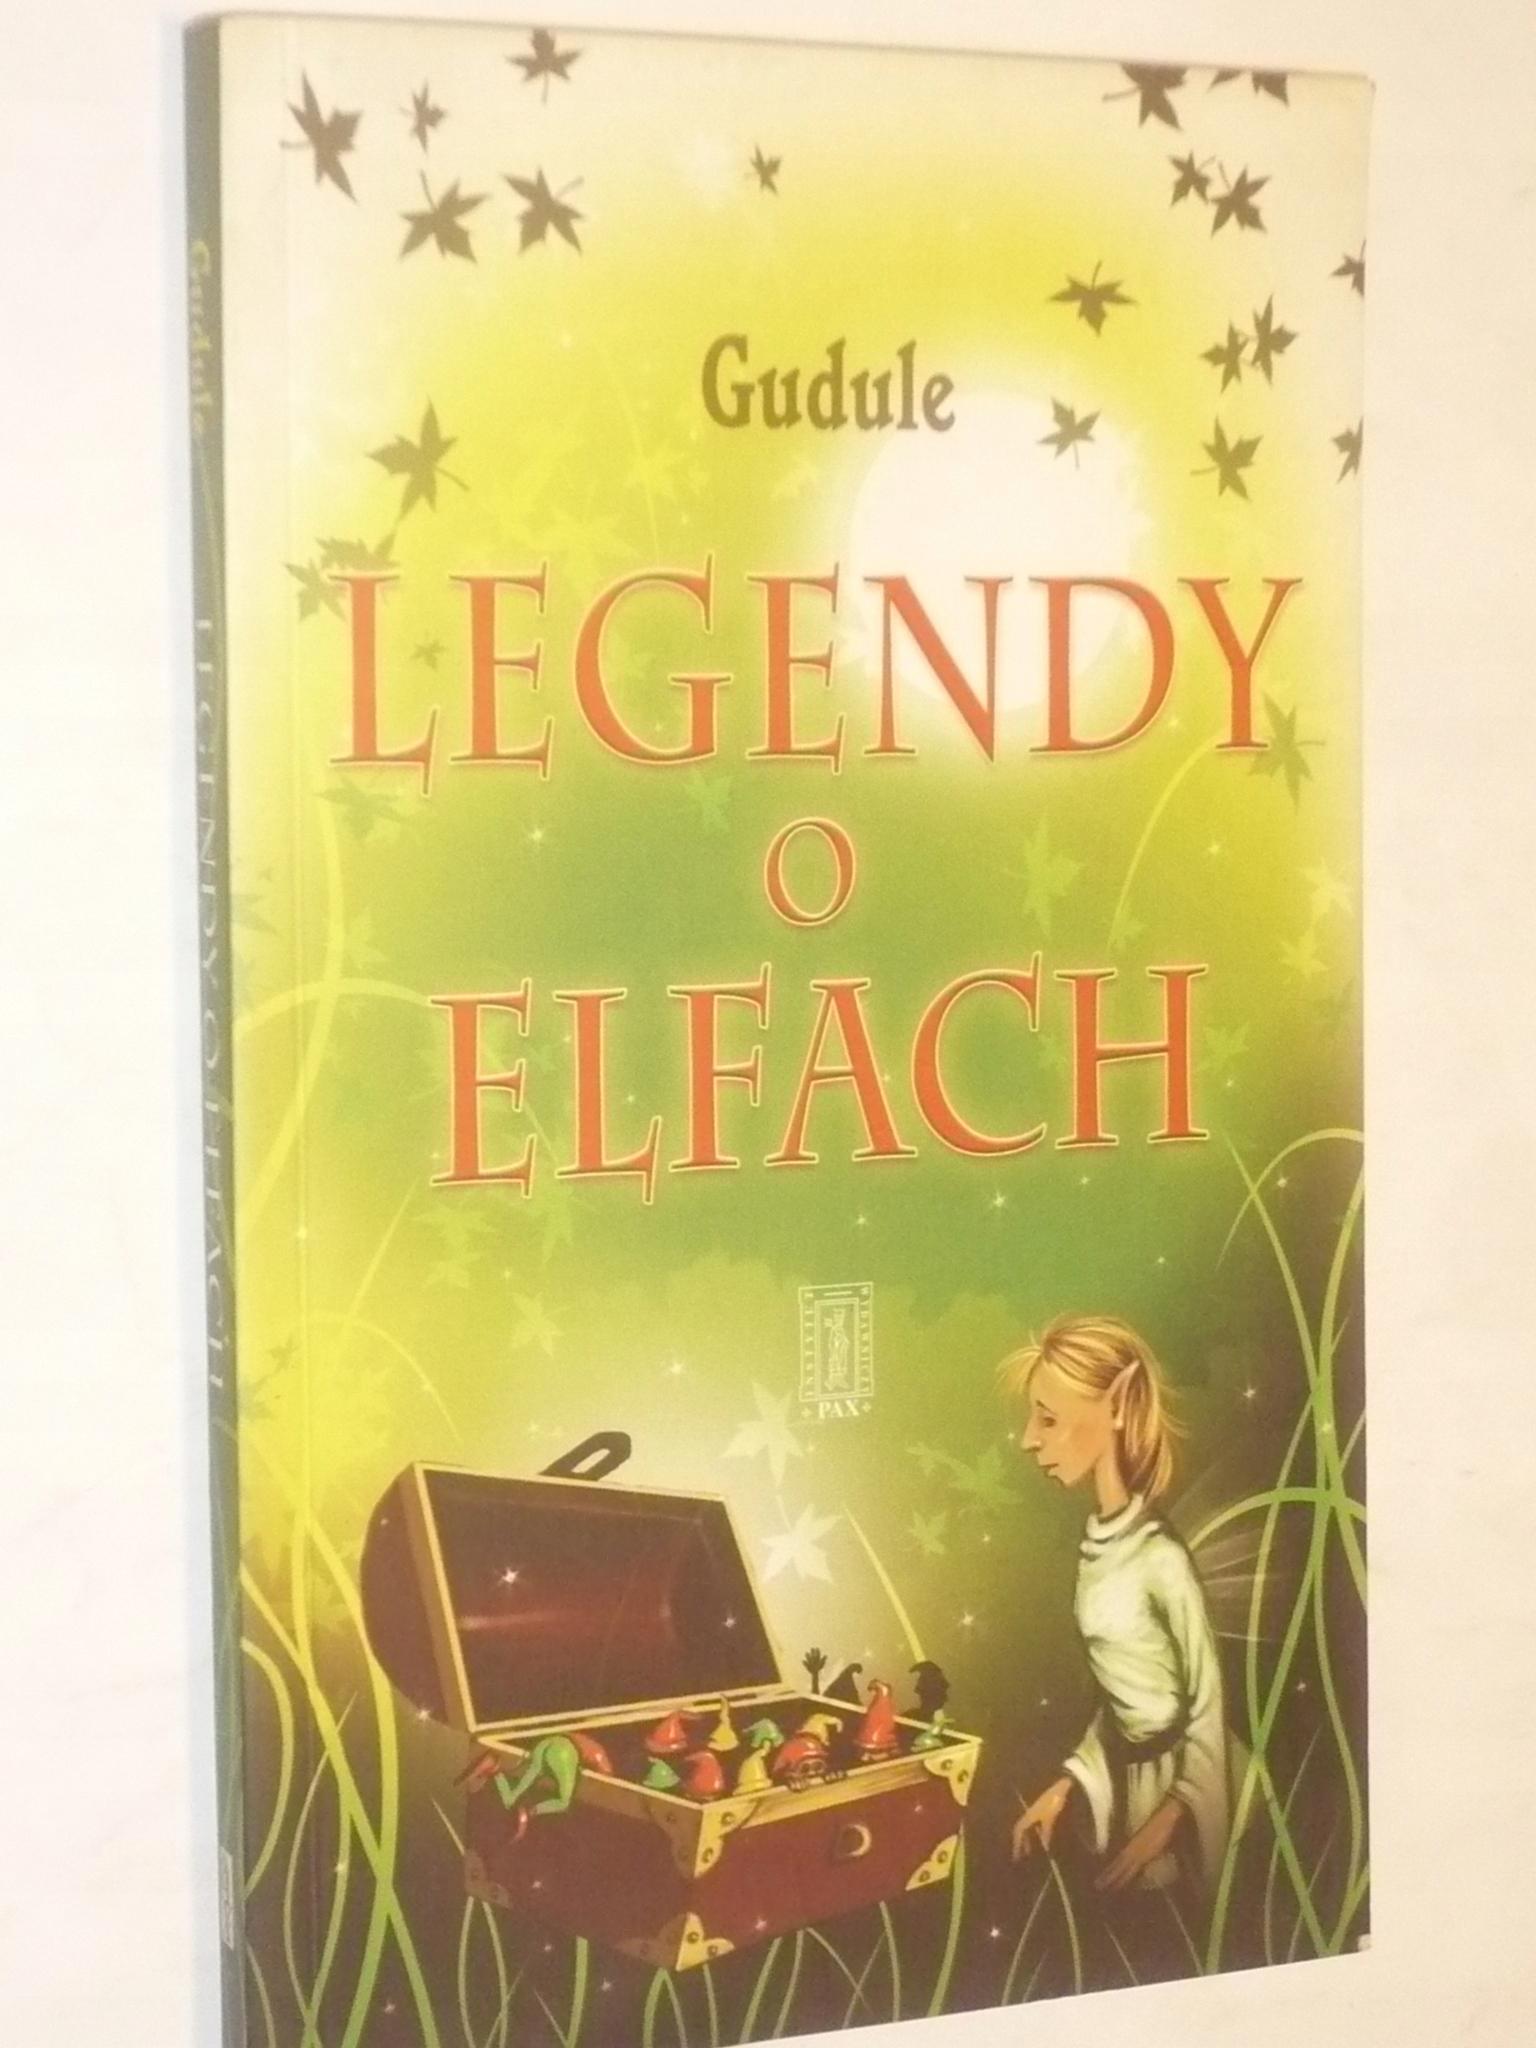 Gudule Legendy O Elfach 7815040921 Oficjalne Archiwum